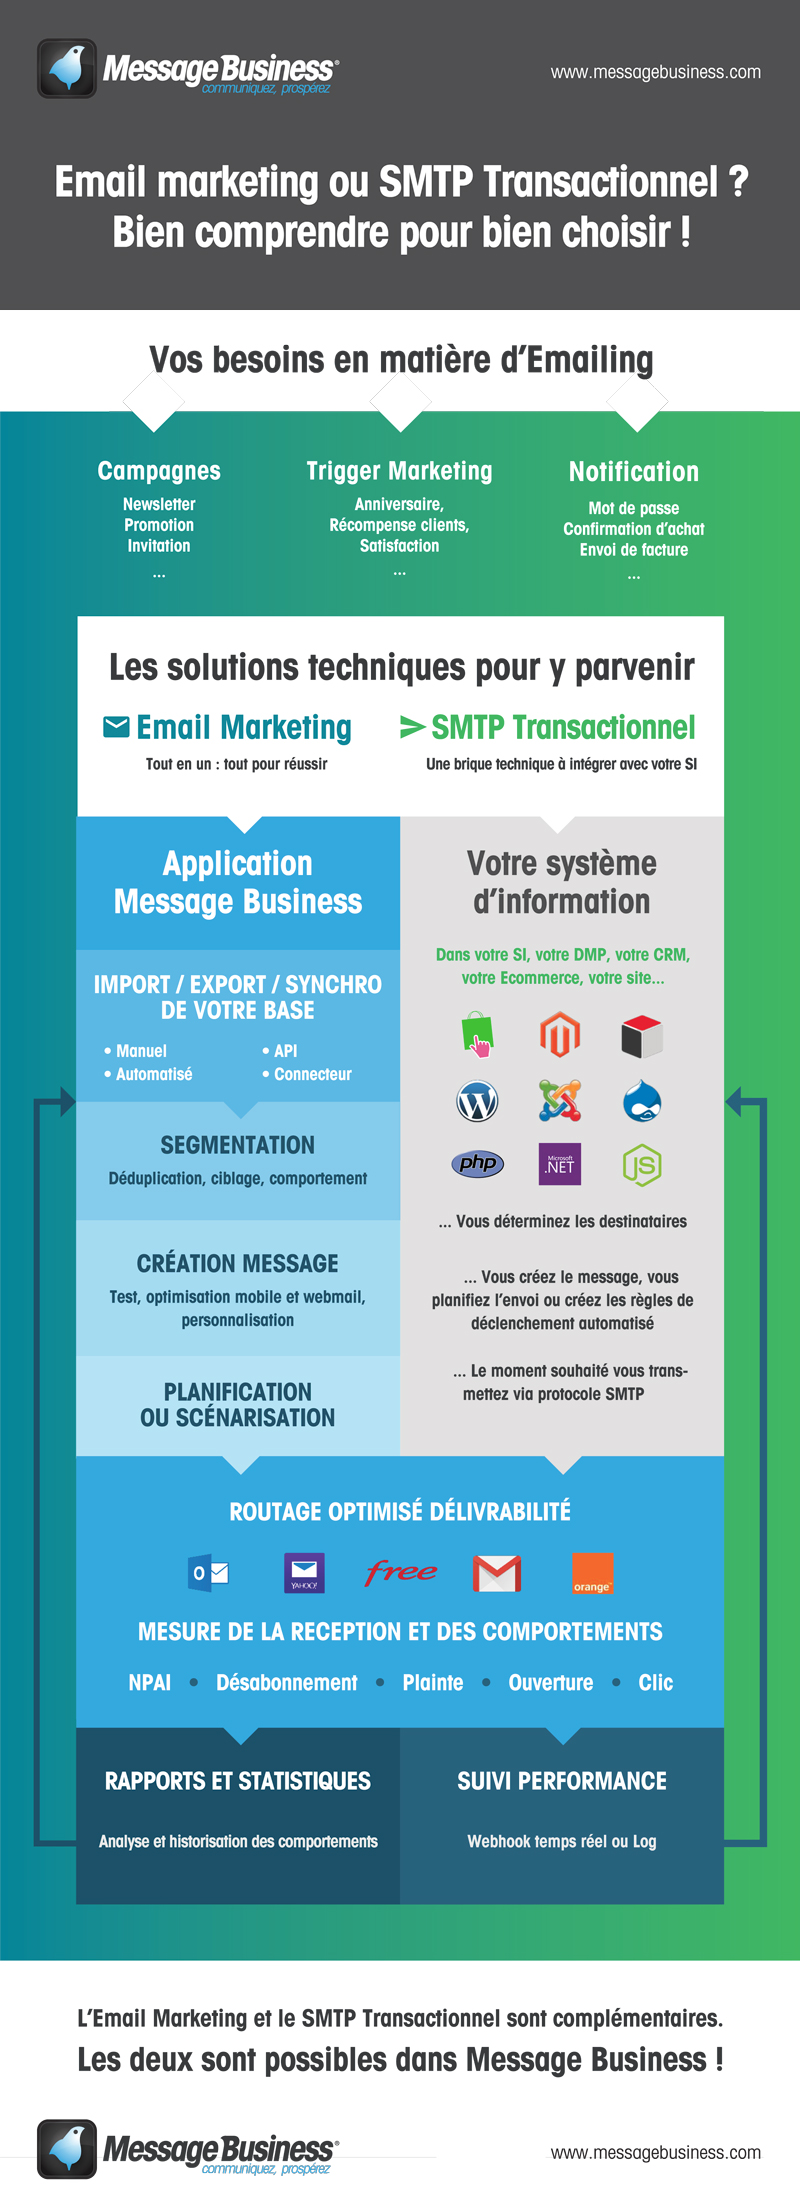 Transactionnel-ou-Email-Marketing-Bien-Choisir